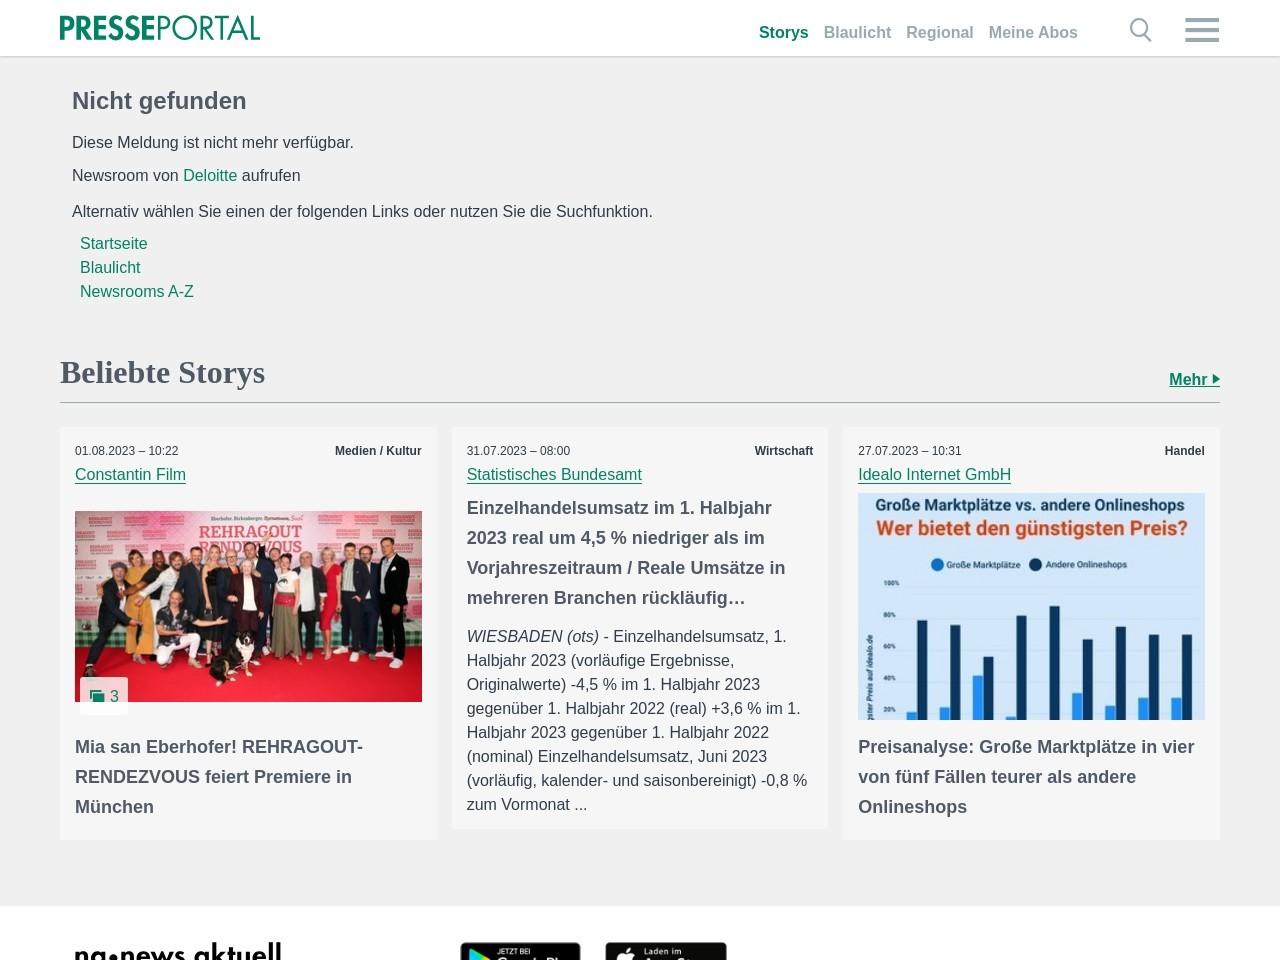 Mobile Games 2015: Keine Experimente Deloitte-Studie identifiziert erste …